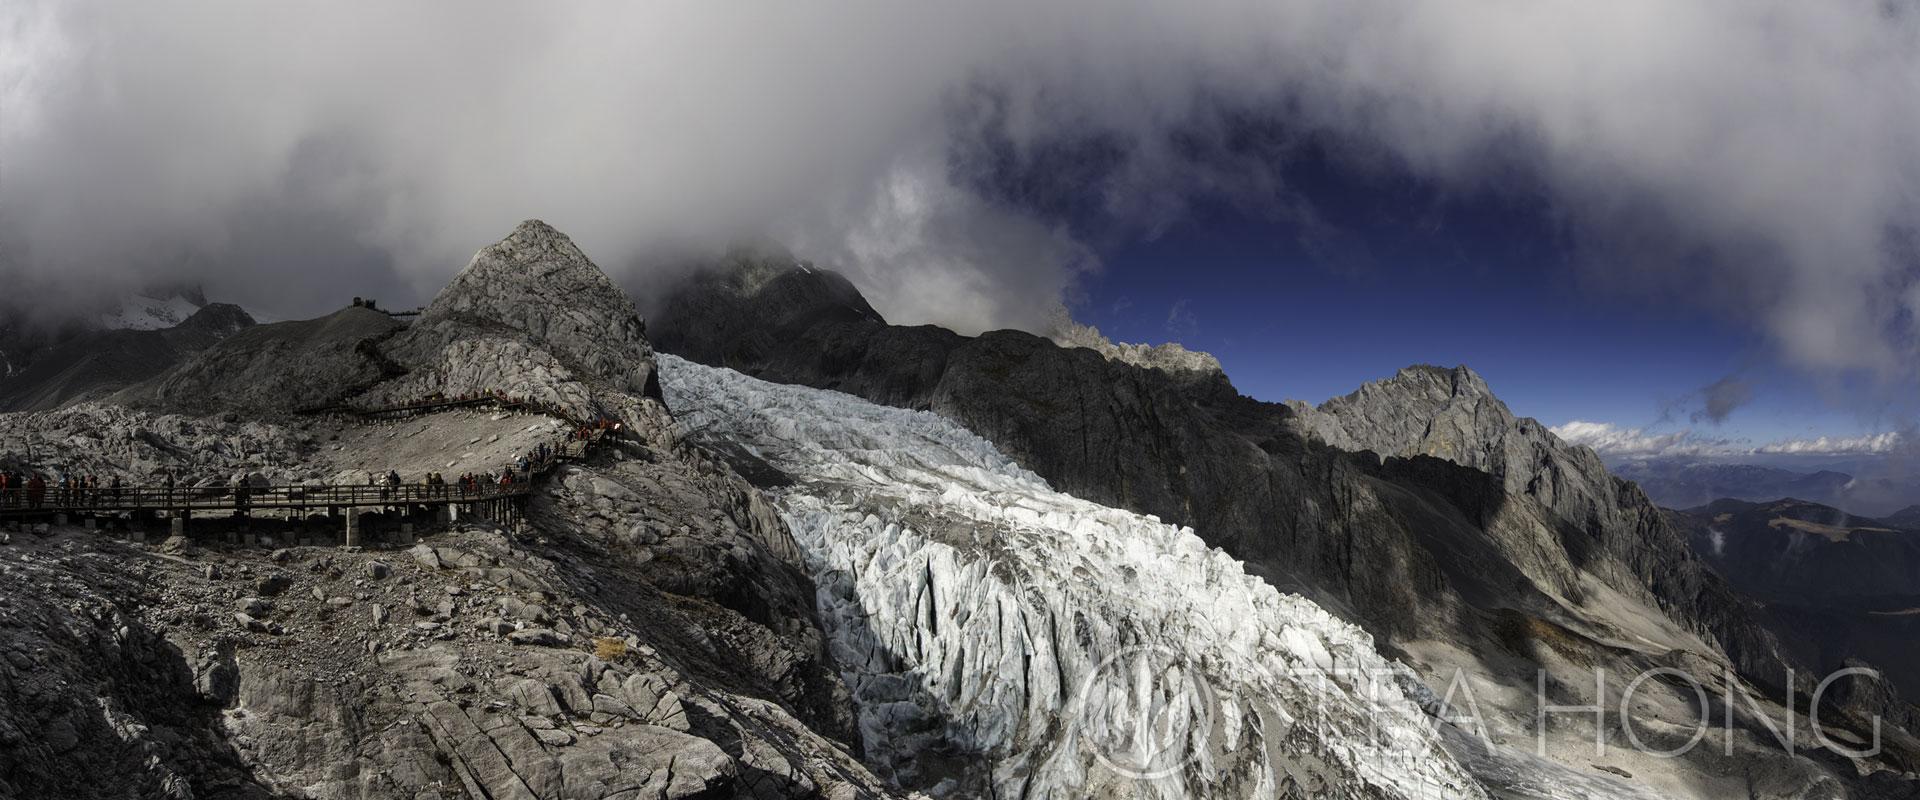 The Great Snow Peak in Yunnan